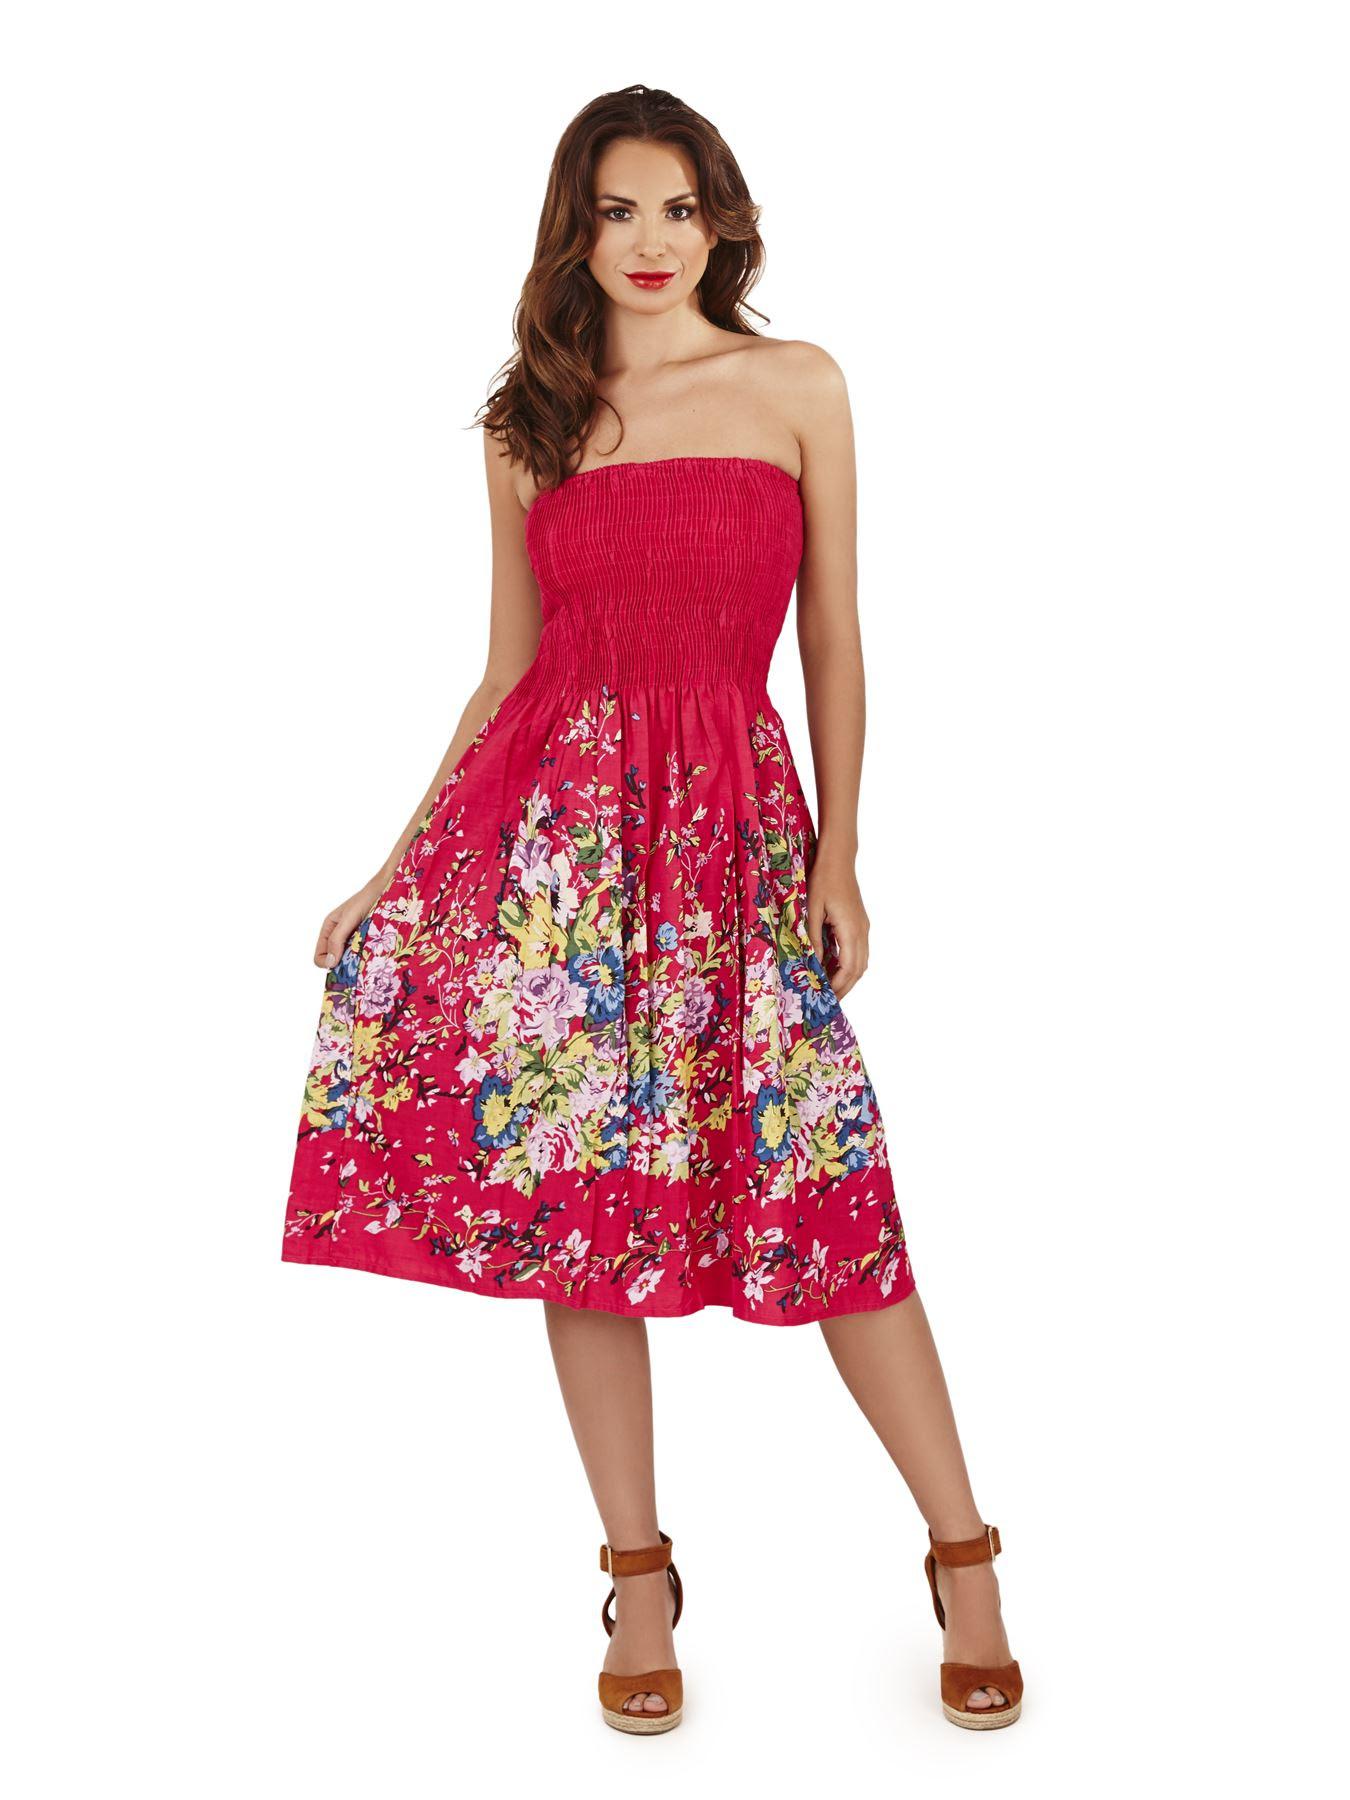 pistachio womens summer beach holiday dress 3in1 knee